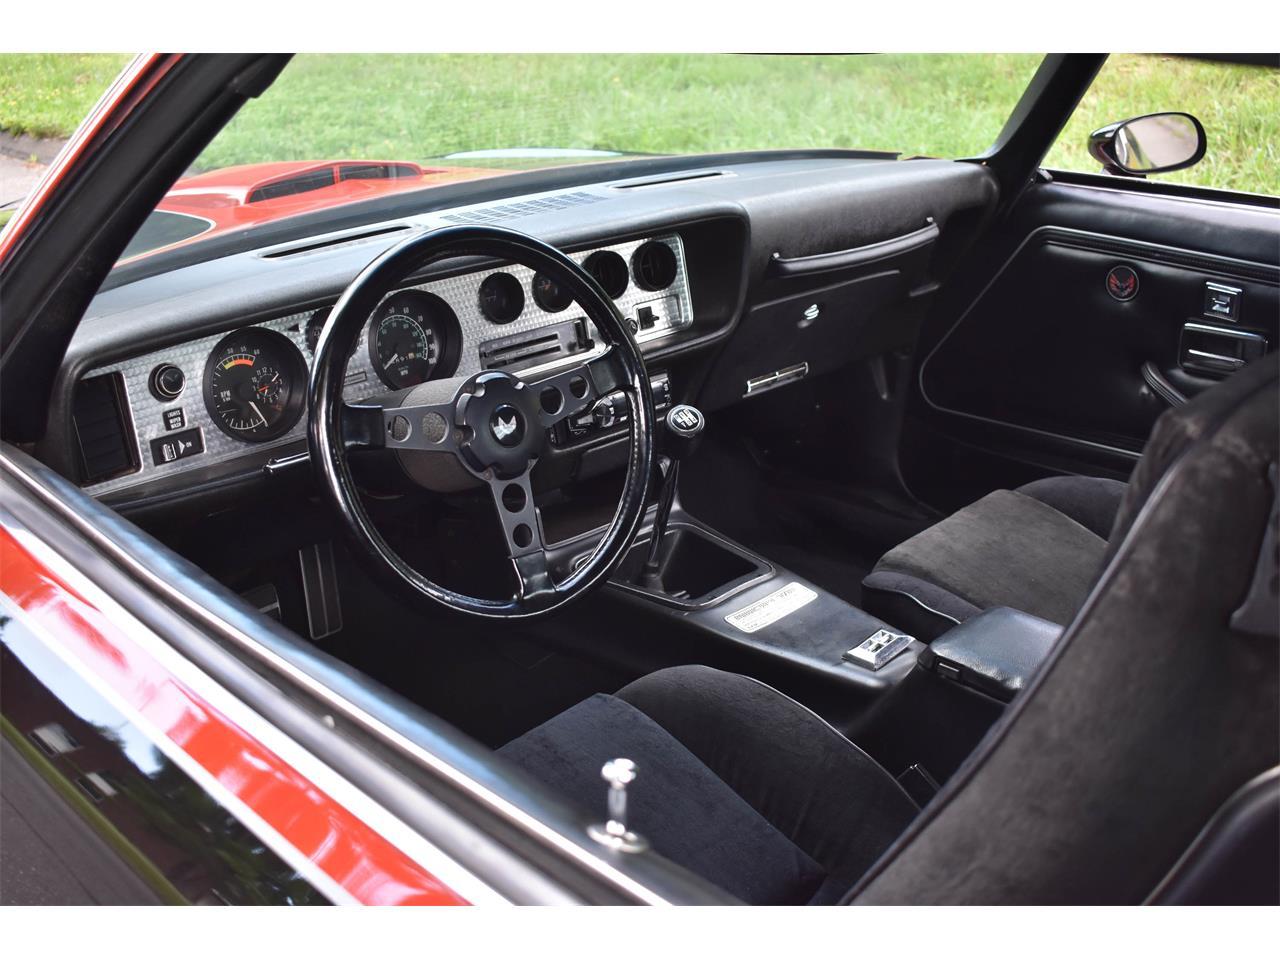 1978 Pontiac Firebird Trans Am (CC-1367830) for sale in Orange, Connecticut